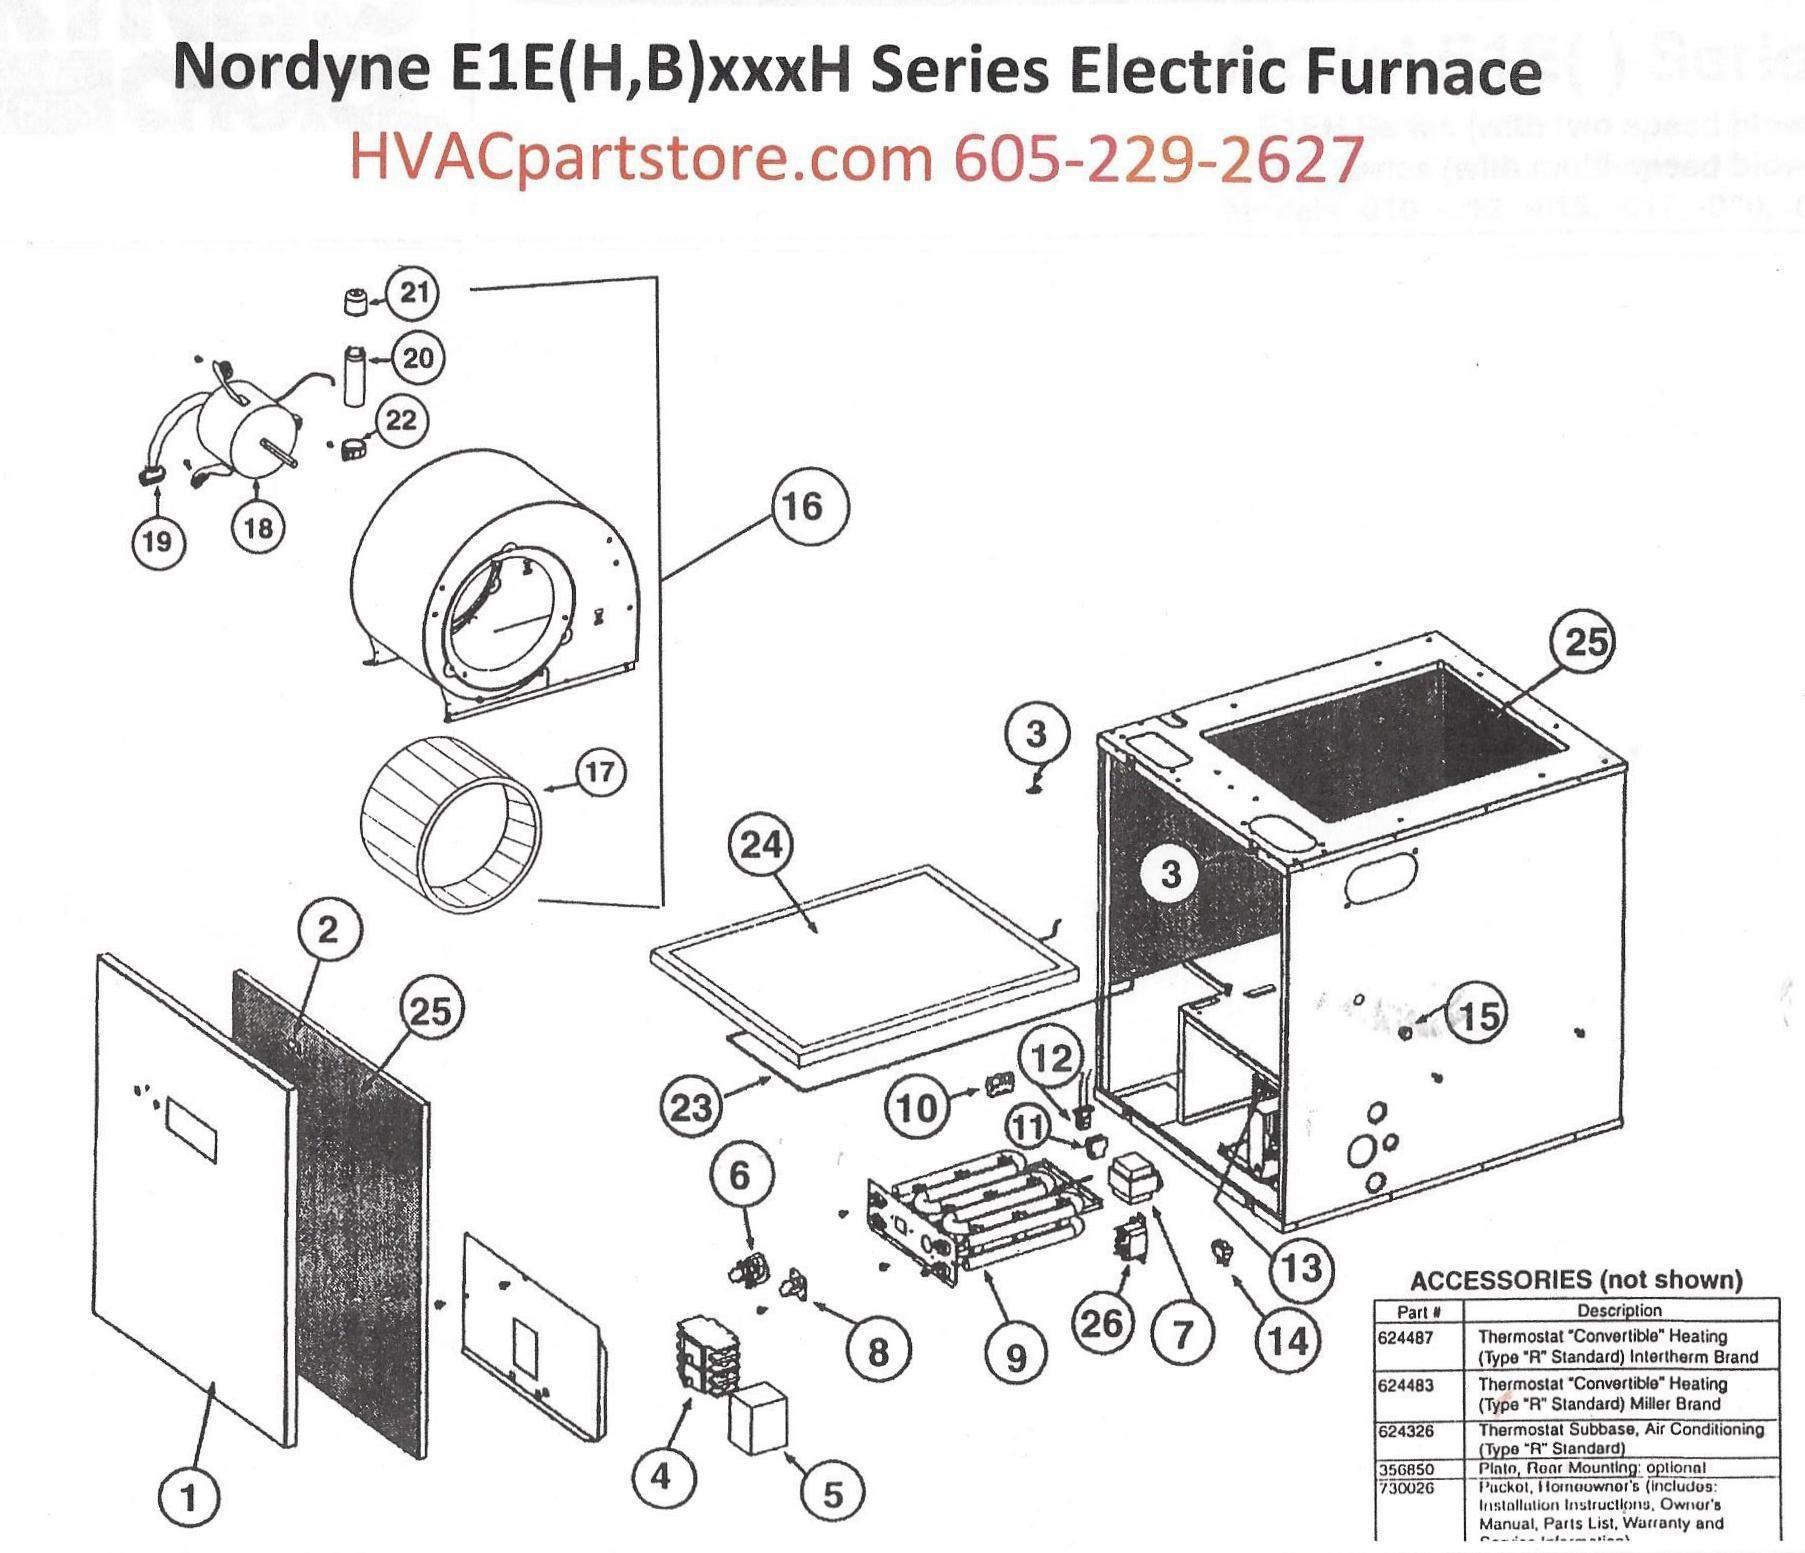 Intertherm Electric Furnace Wiring Diagram Luxury Intertherm Furnace Parts Diagram Wiring Diagrams